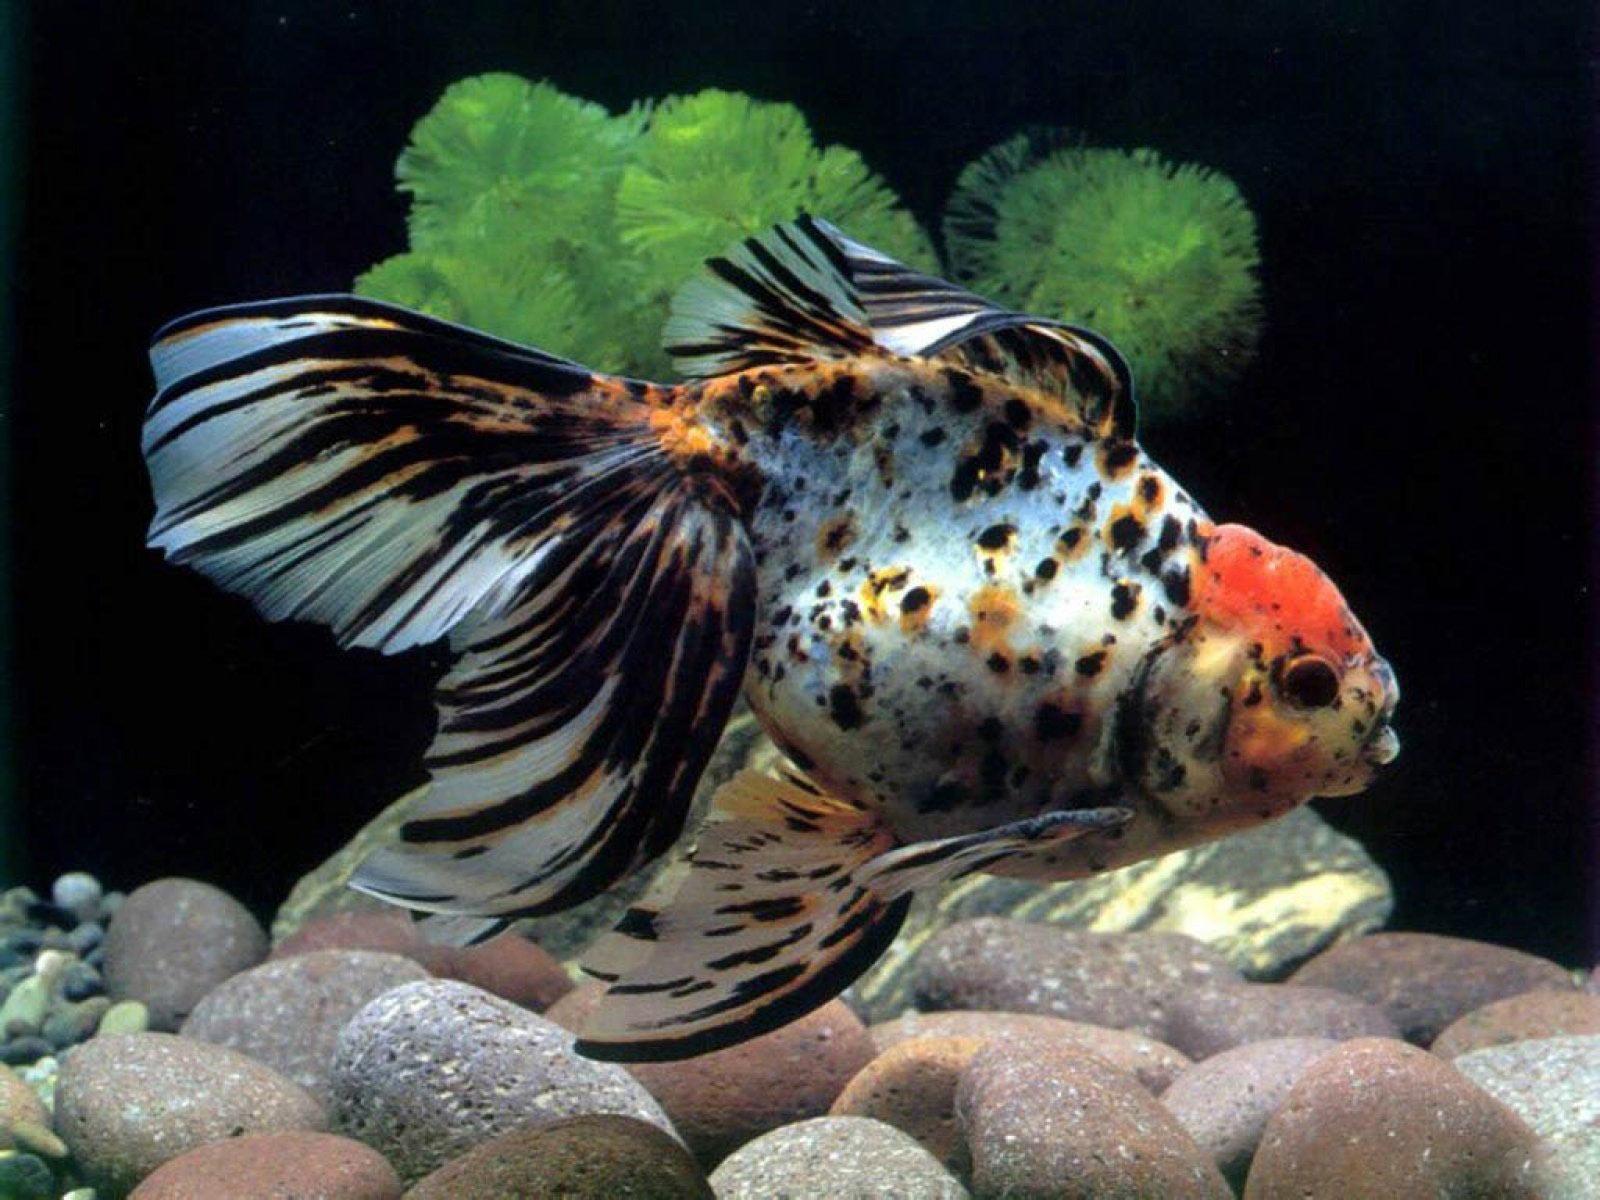 http://3.bp.blogspot.com/-Wfy0z43Uwho/TDjFlm0r13I/AAAAAAAAAFE/gg8dV9eg3qs/s1600/sfondo+pesce+per+acquario+Amphilophus.jpg